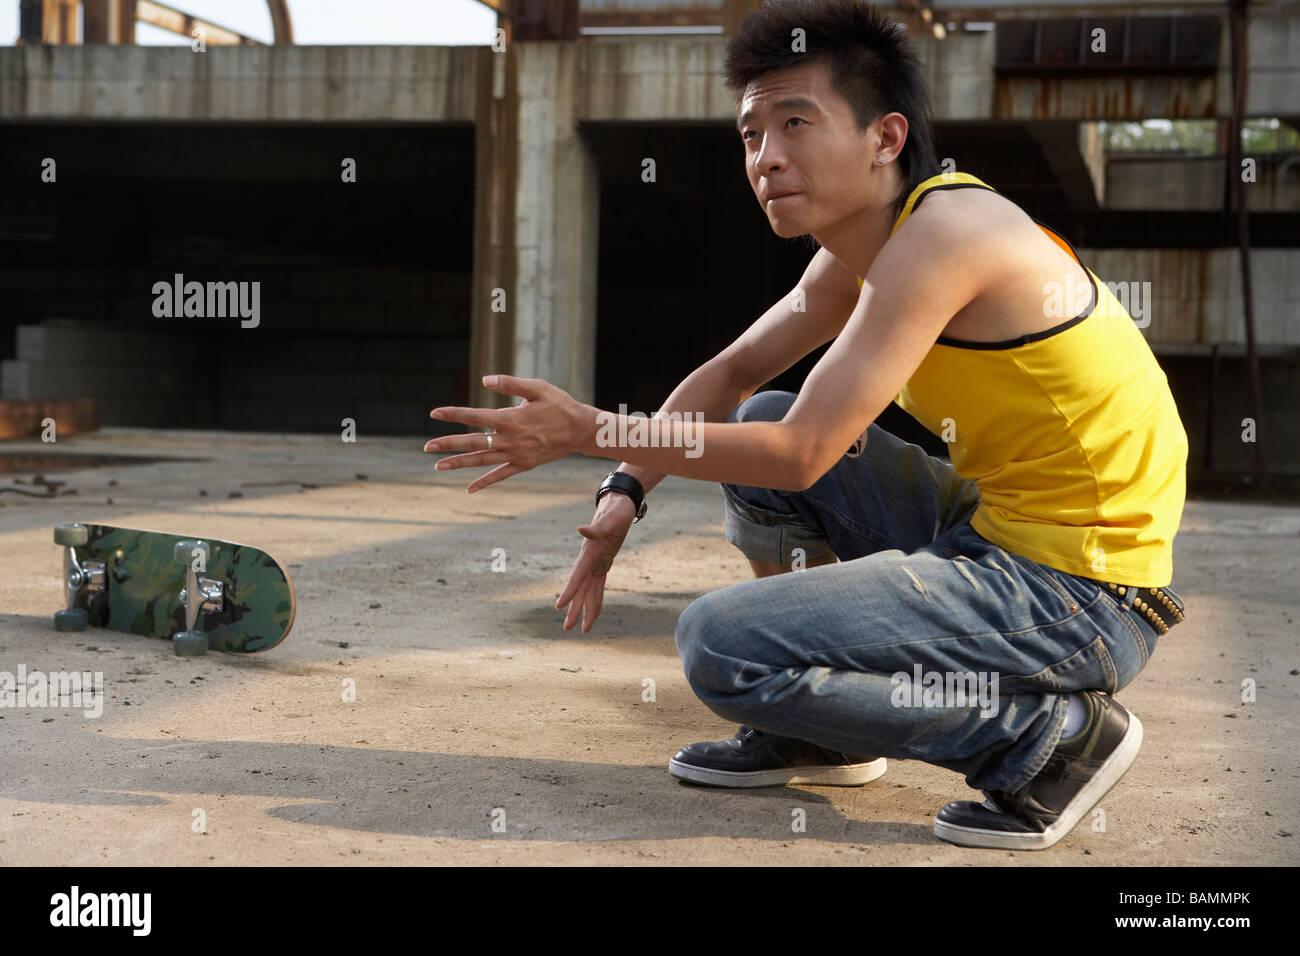 Man Crouching Down - Stock Image